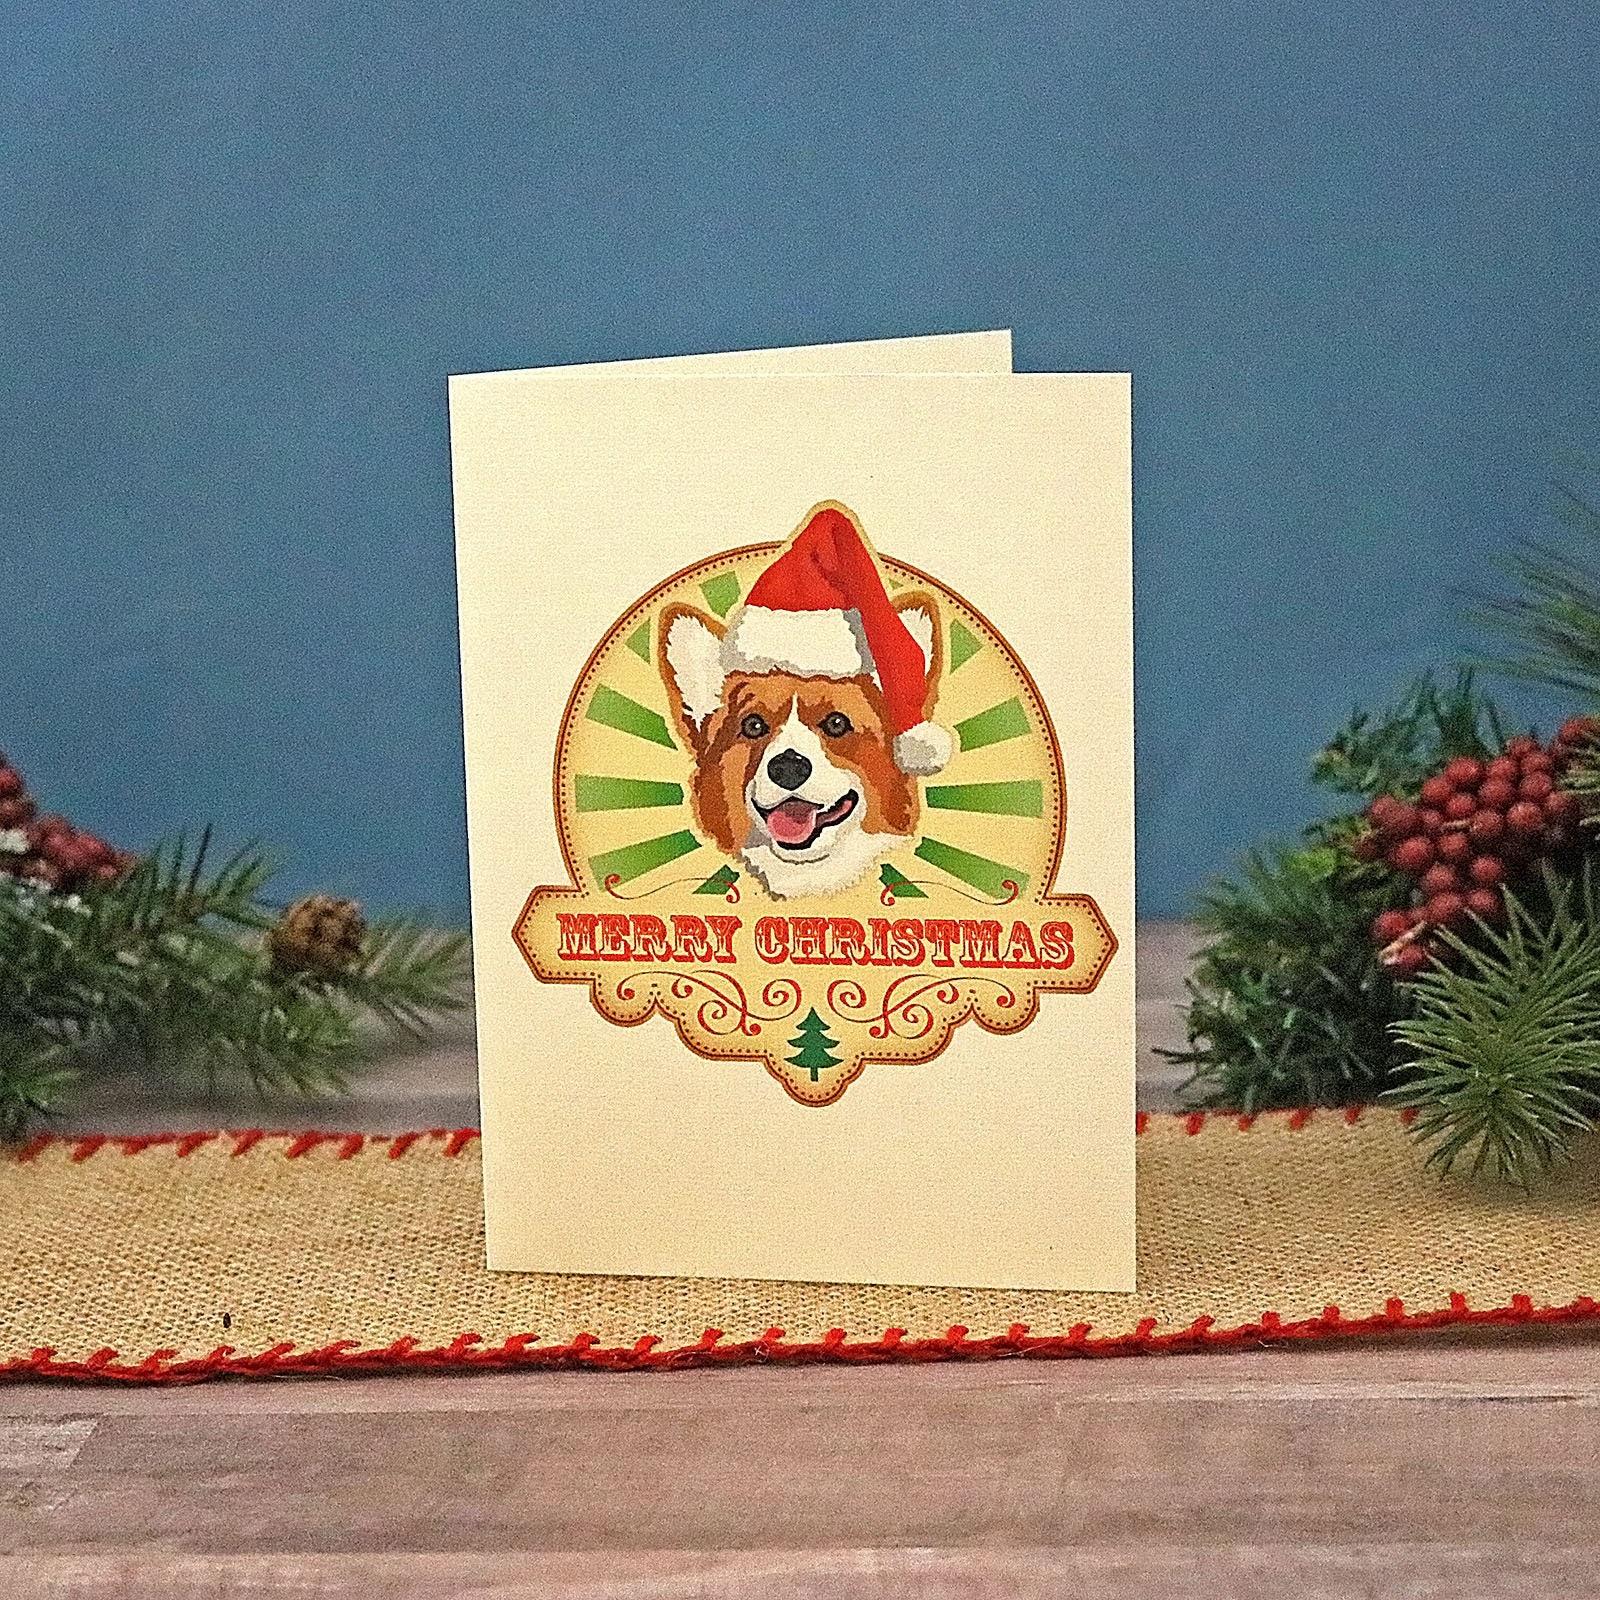 Corgi Christmas Cards Holiday Cards Pack Corgi Dog Santa | Etsy